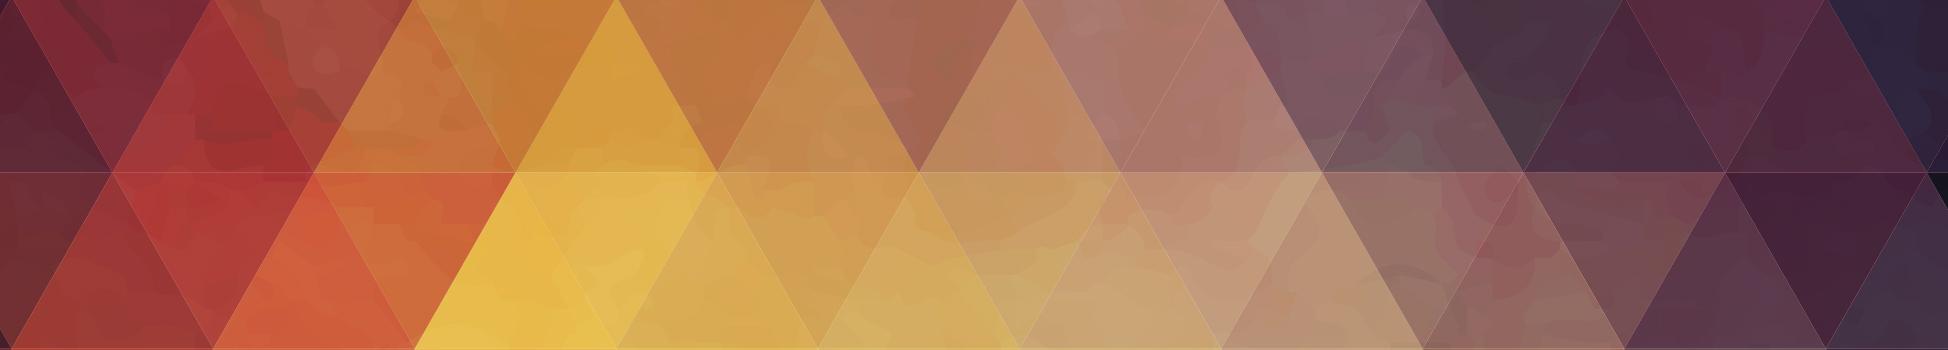 bn-homepage-conceitos-frase-1-01B